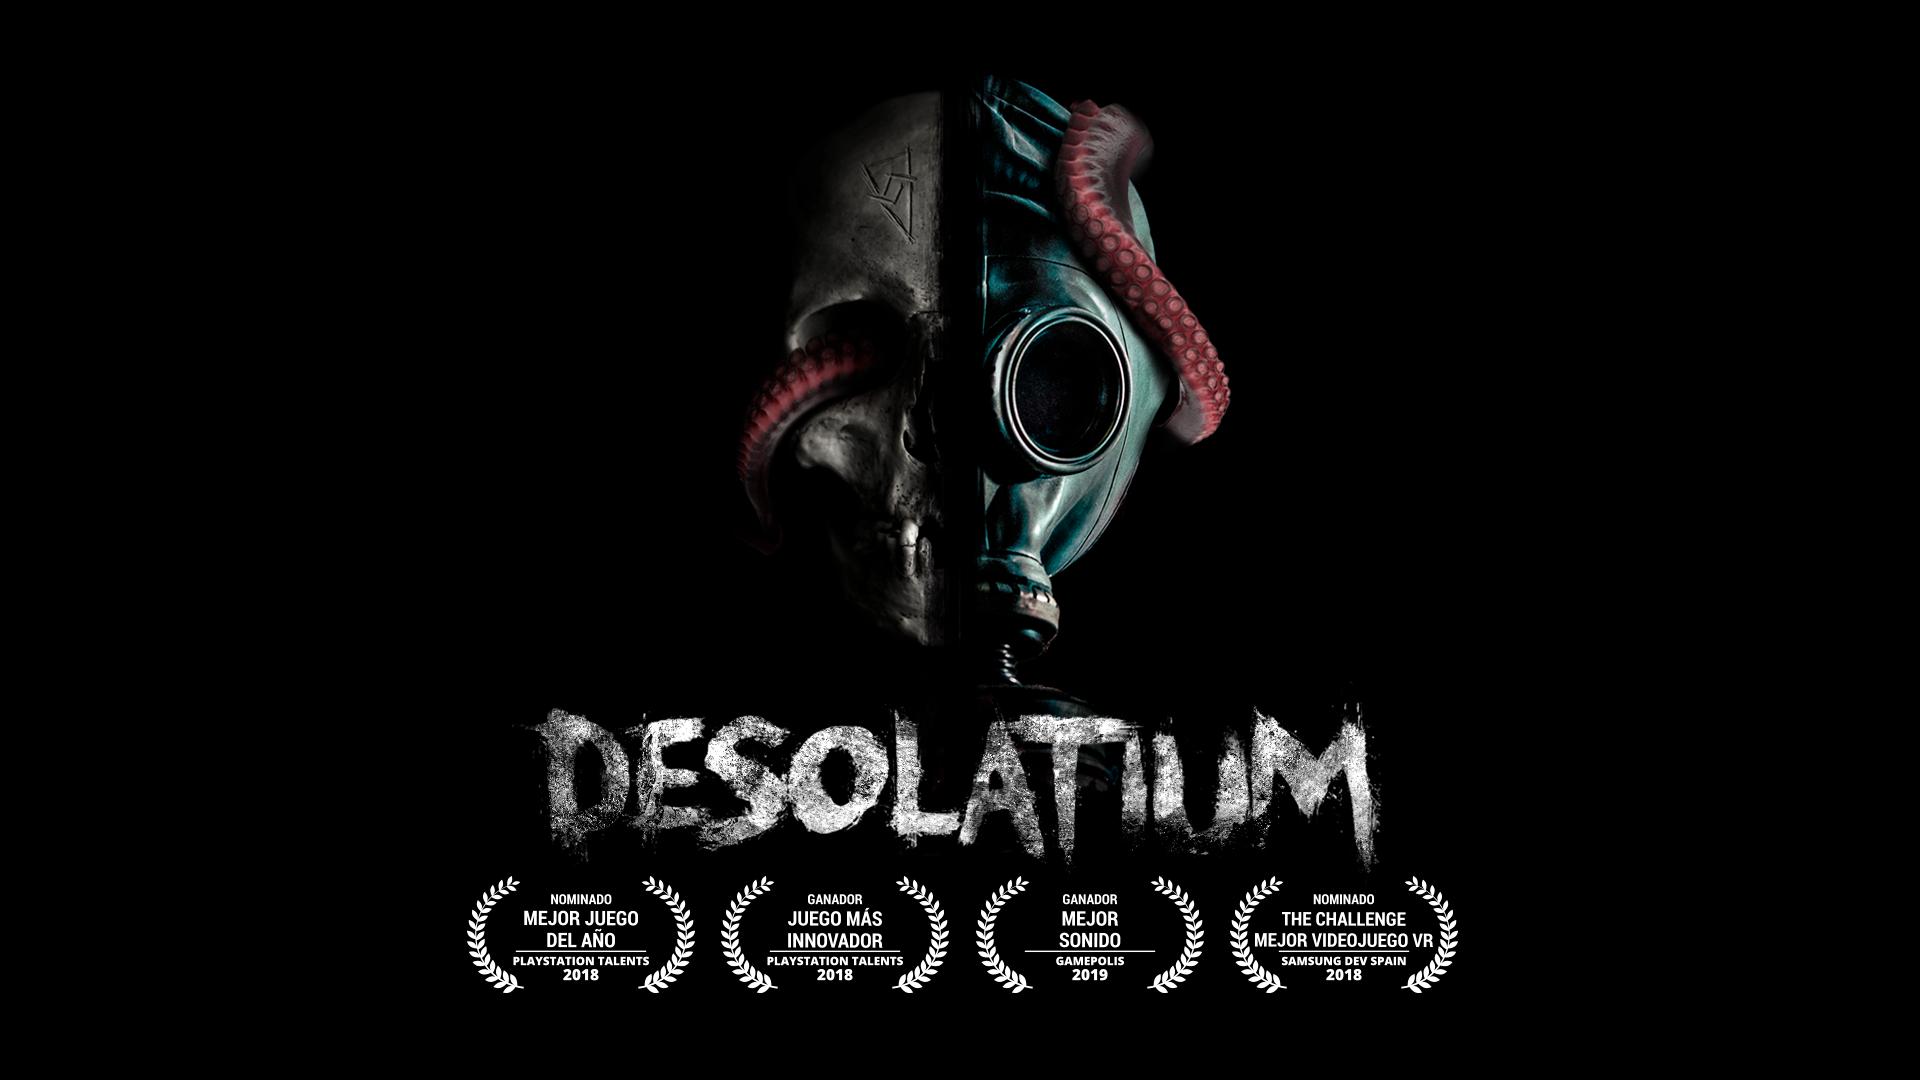 Desolatium traerá horrores lovecraftianos a Murcia